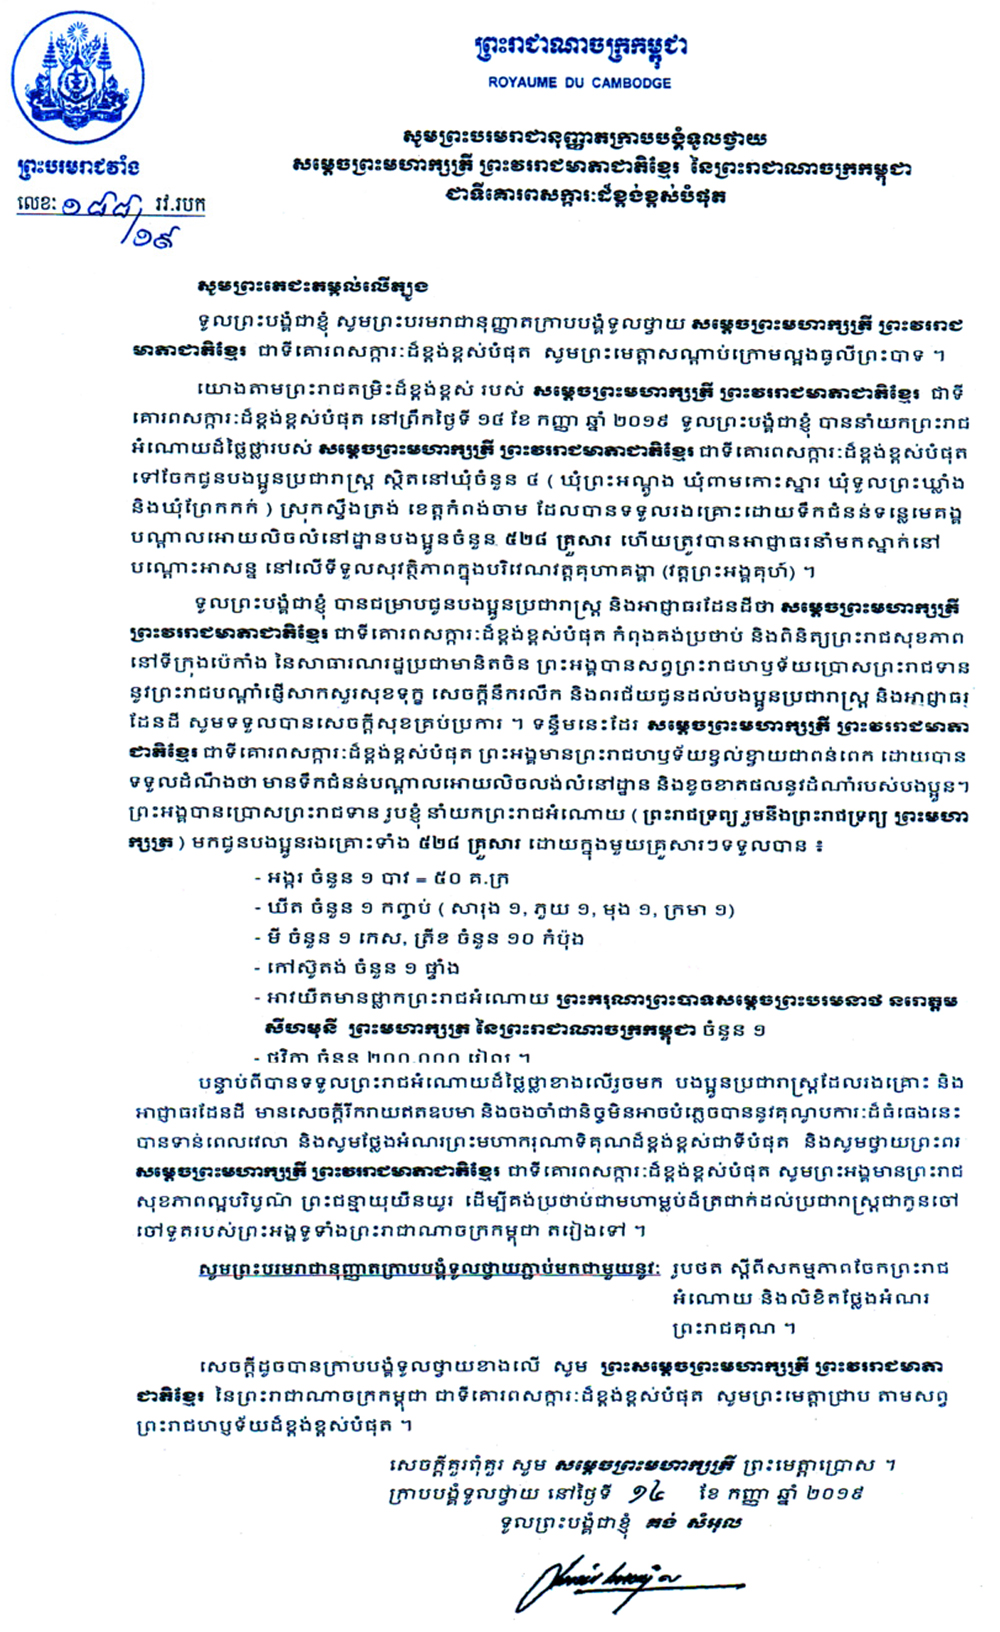 All/activity/ActiondeNorodomSihanouk/2019/Septembre/id2052/001.jpg